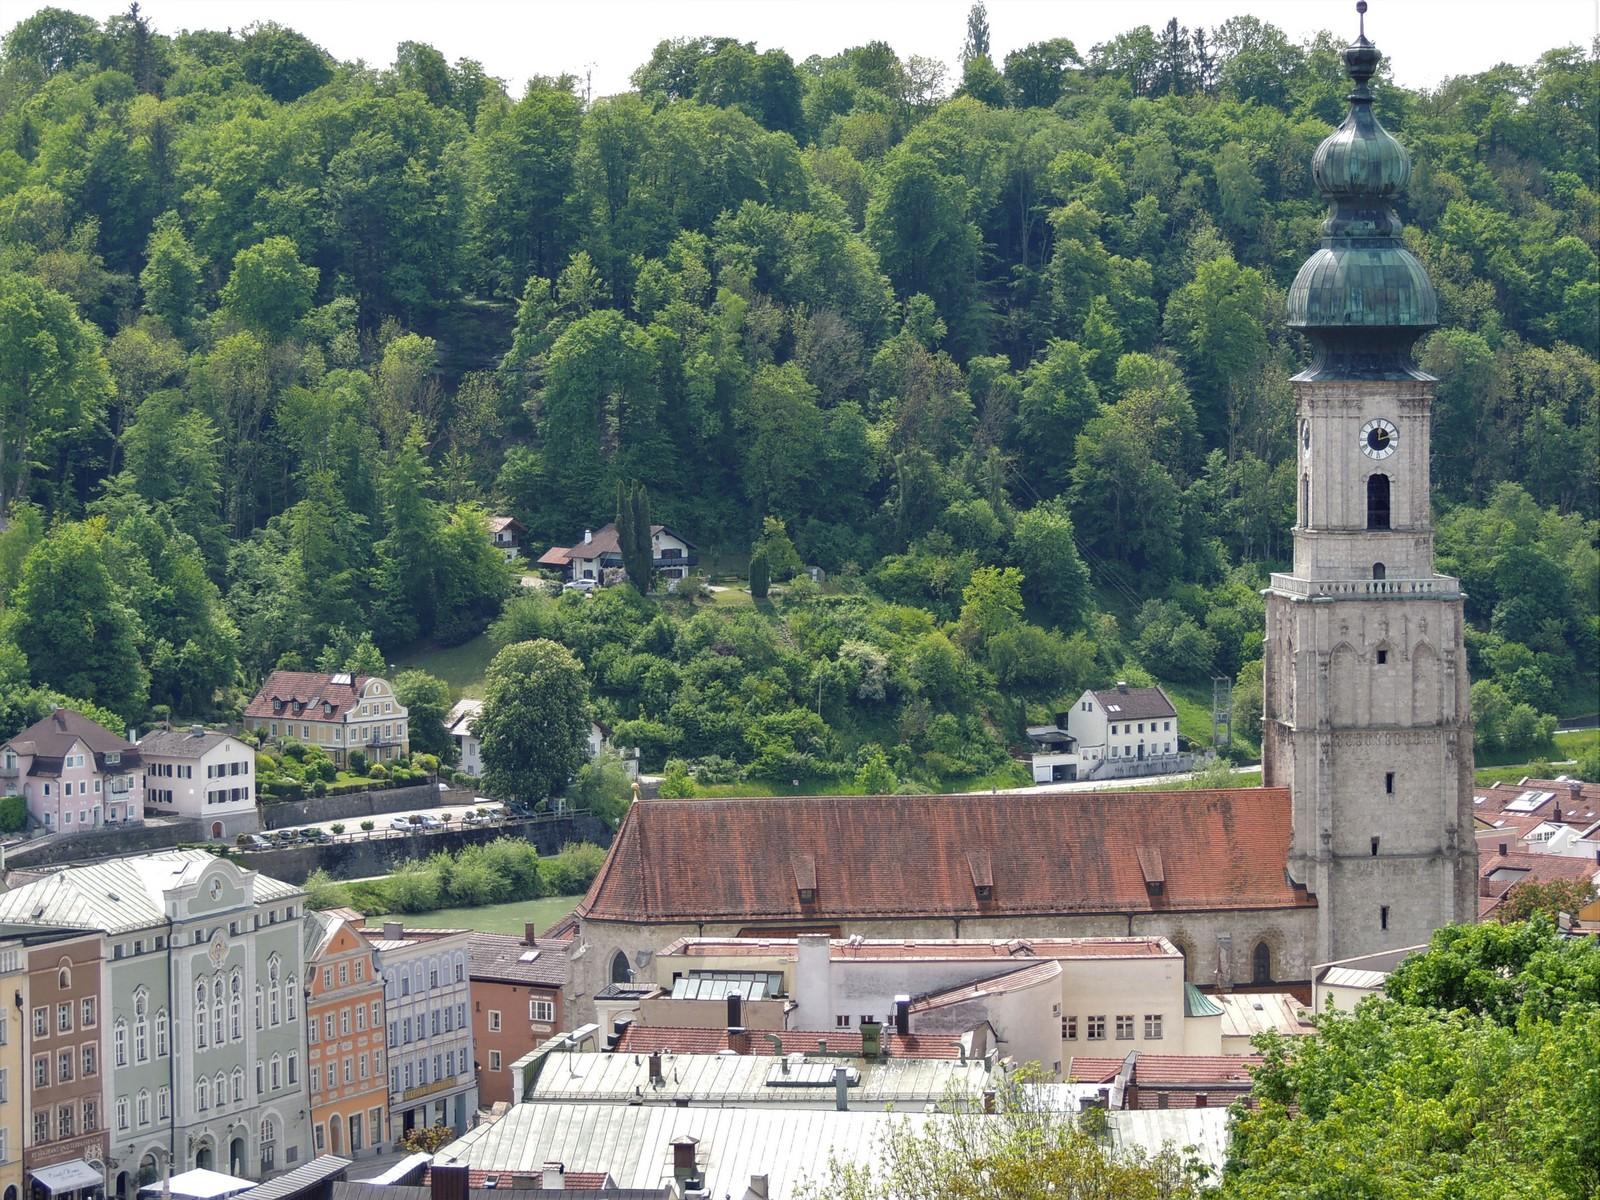 St. Jakob Burghausen